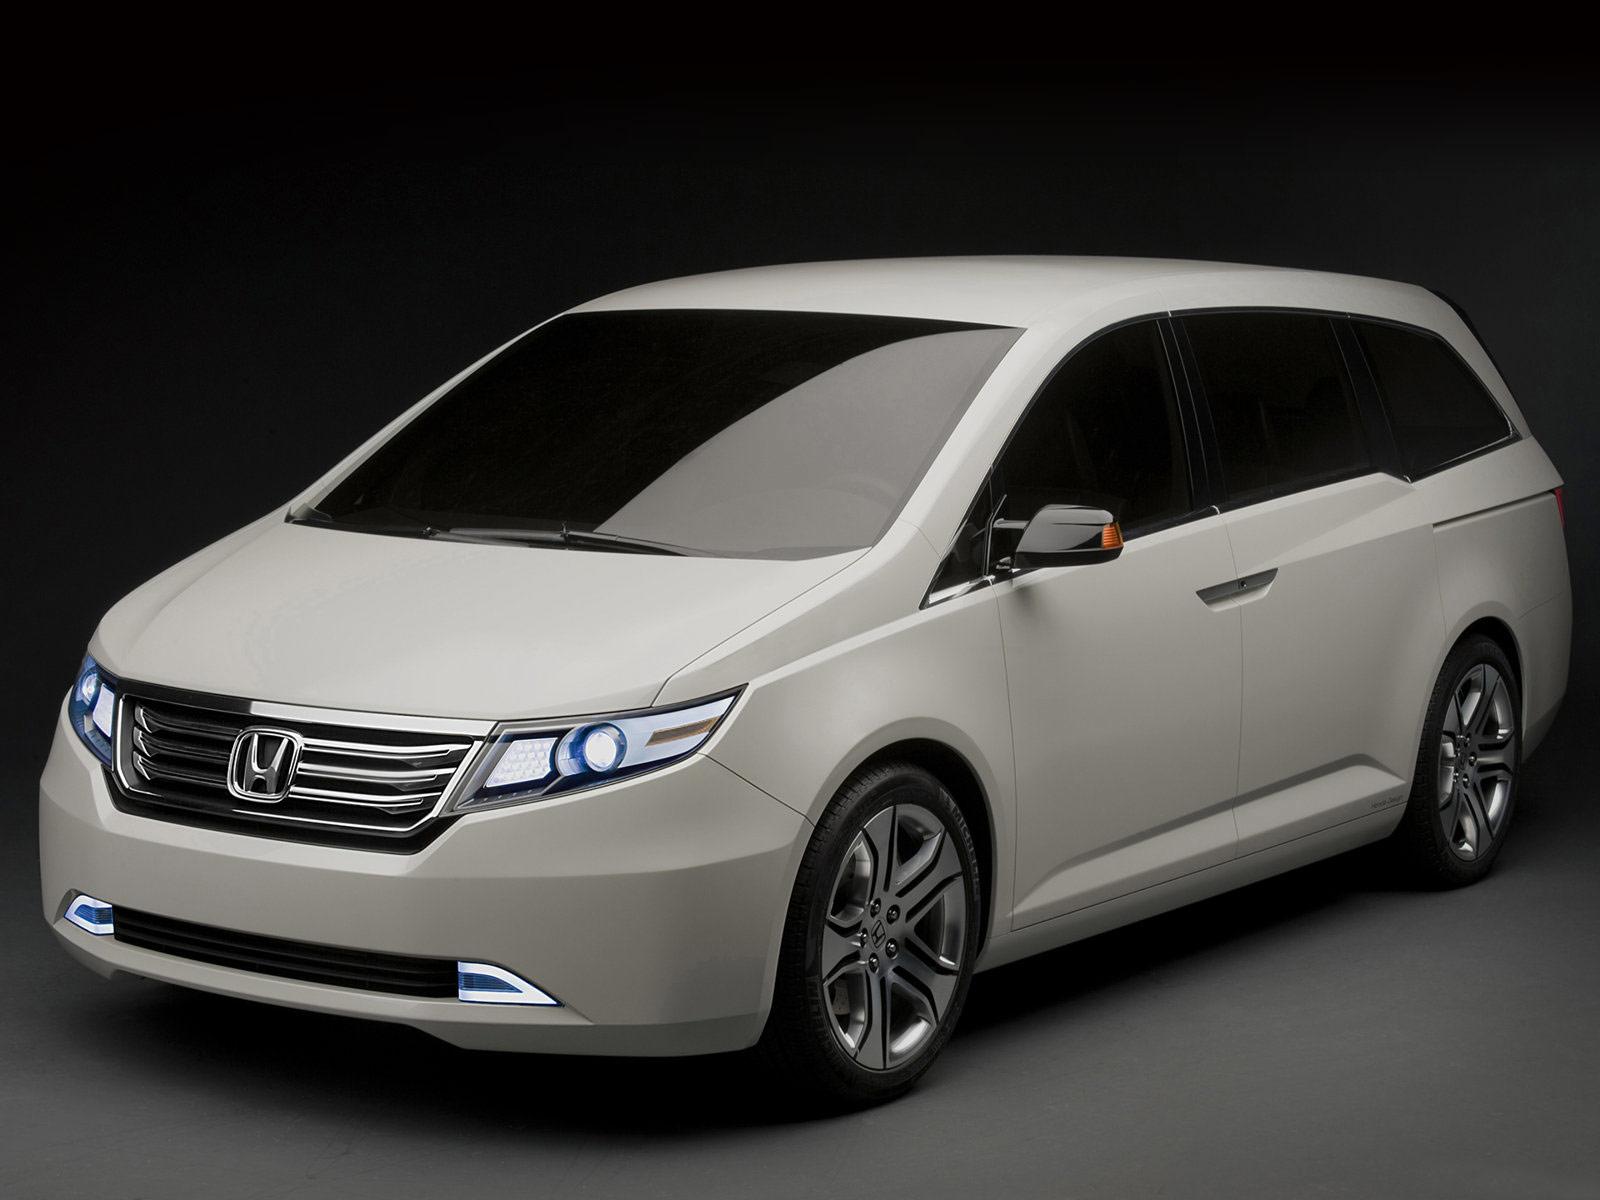 2010 Honda Odyssey Concept Car Photos Accident Lawyers Info